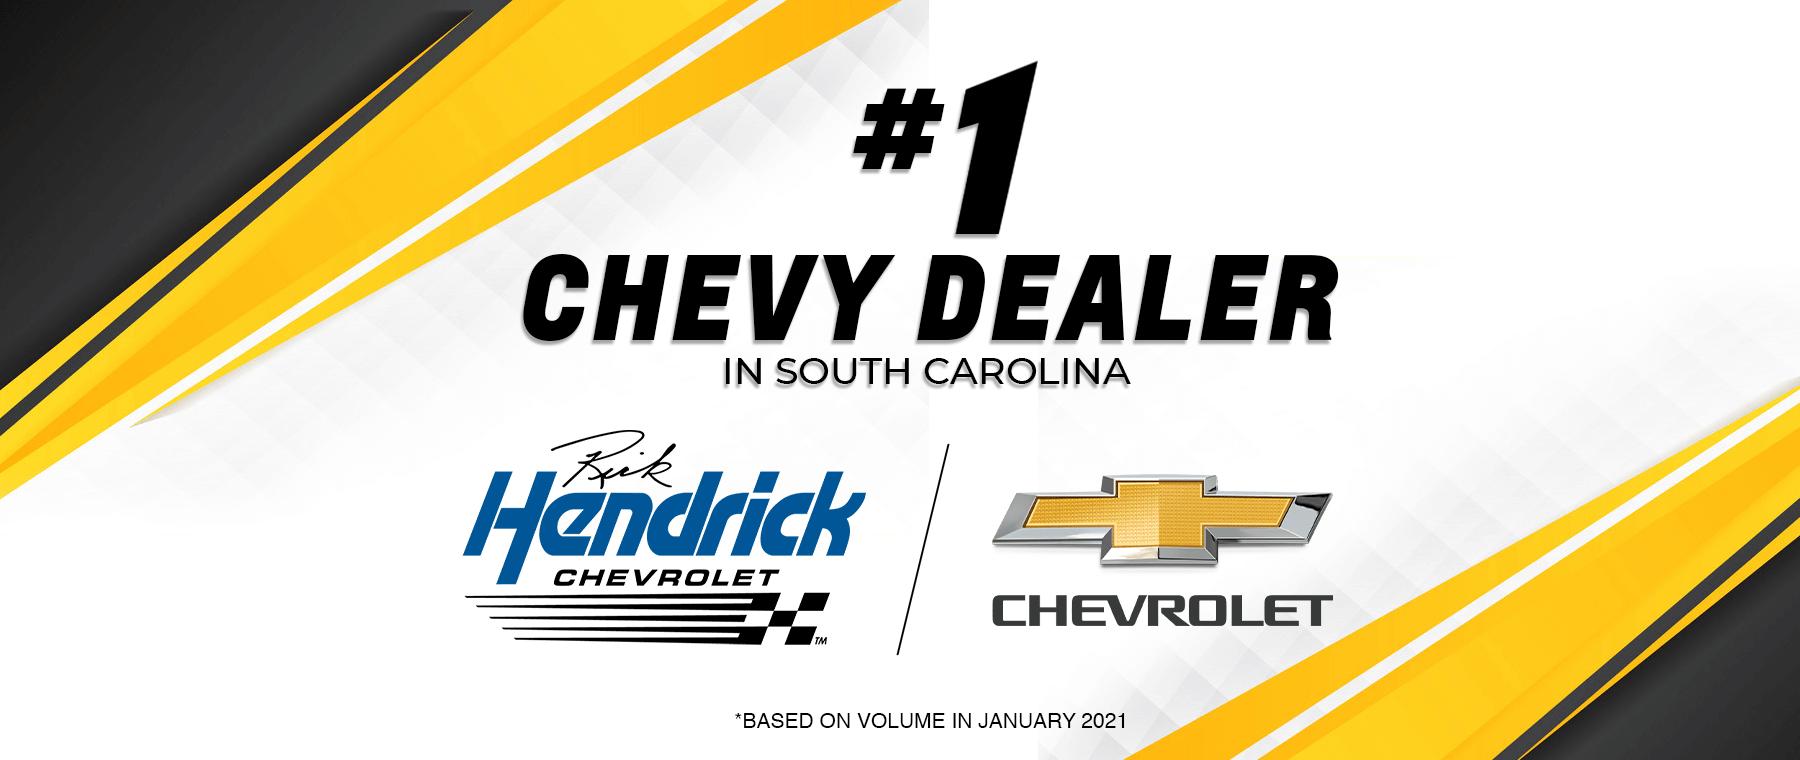 Rick-Hendrick-Chevrolet-Charleston-Feb21_TR_-1-Chevy-Dealer-1800x760-optimized